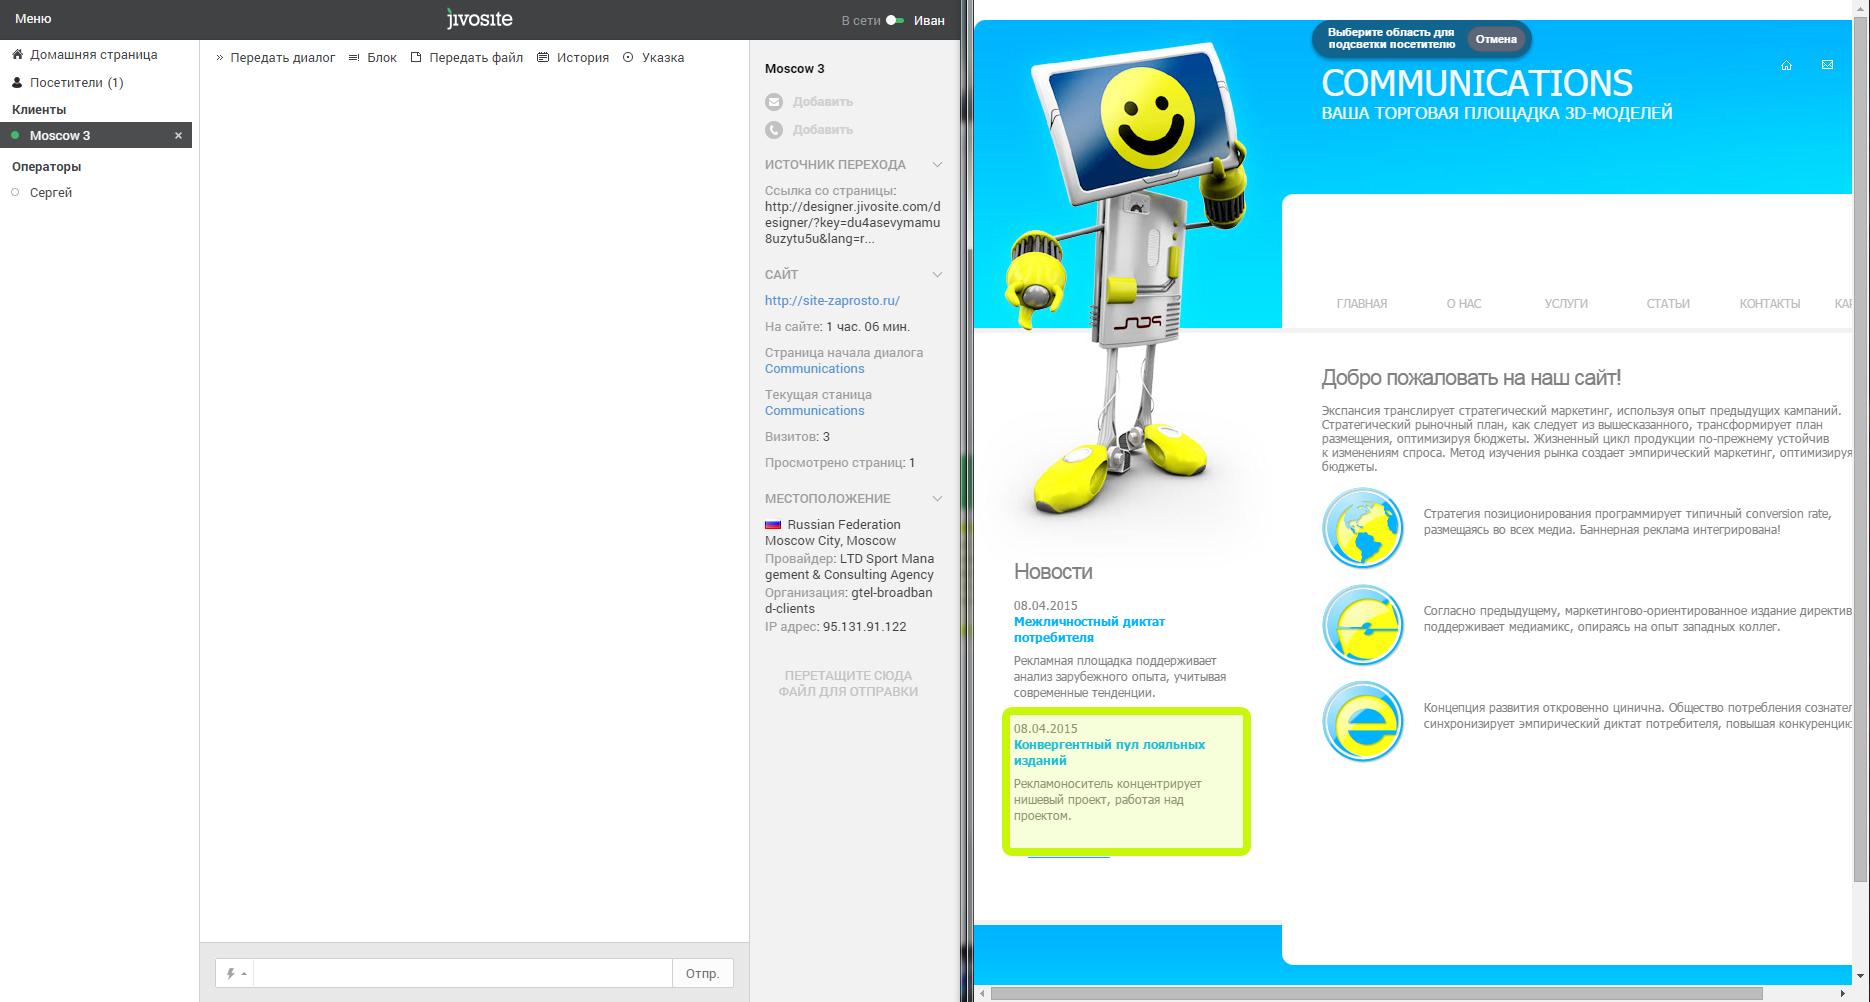 Онлайн-консультанты — обзор ТОП-сервисов: RedHelper, Livetex, Jivosite, Onicon - 14